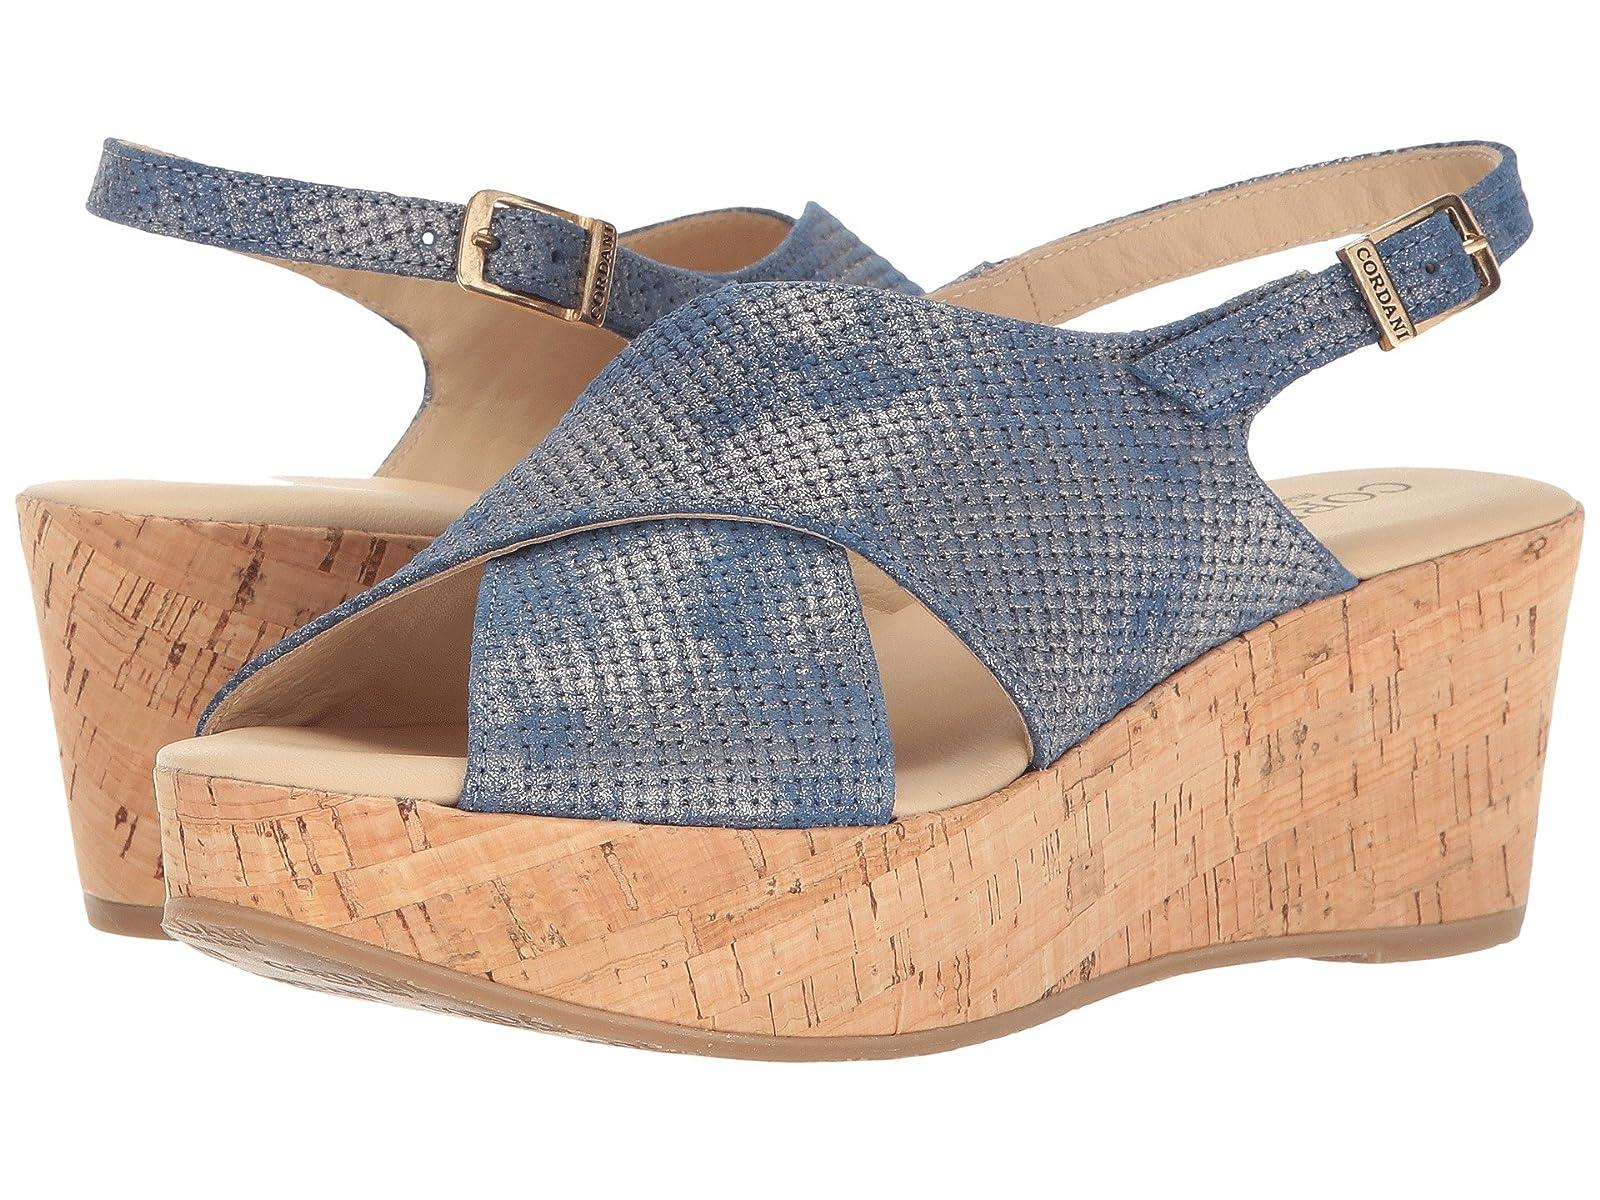 Cordani DelightCheap and distinctive eye-catching shoes